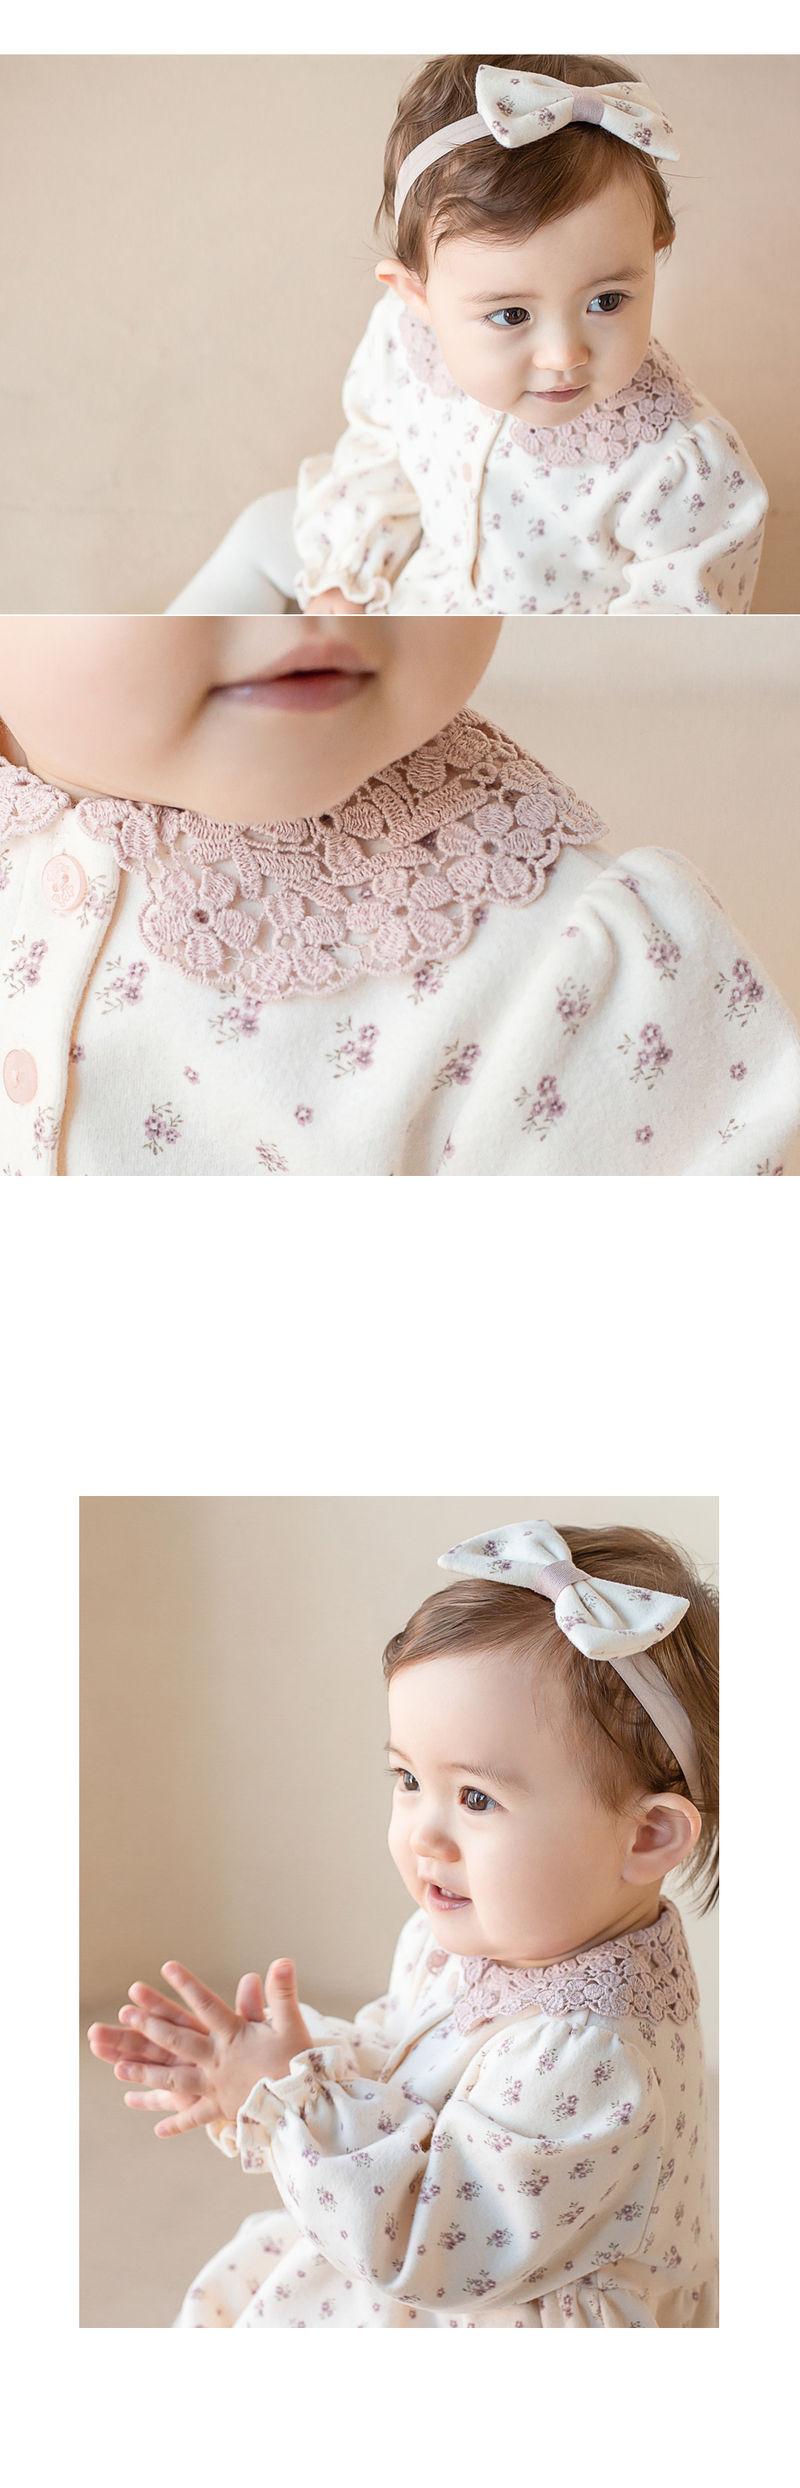 HAPPY PRINCE - Korean Children Fashion - #Kfashion4kids - Vane Body Suit + Hairband - 2